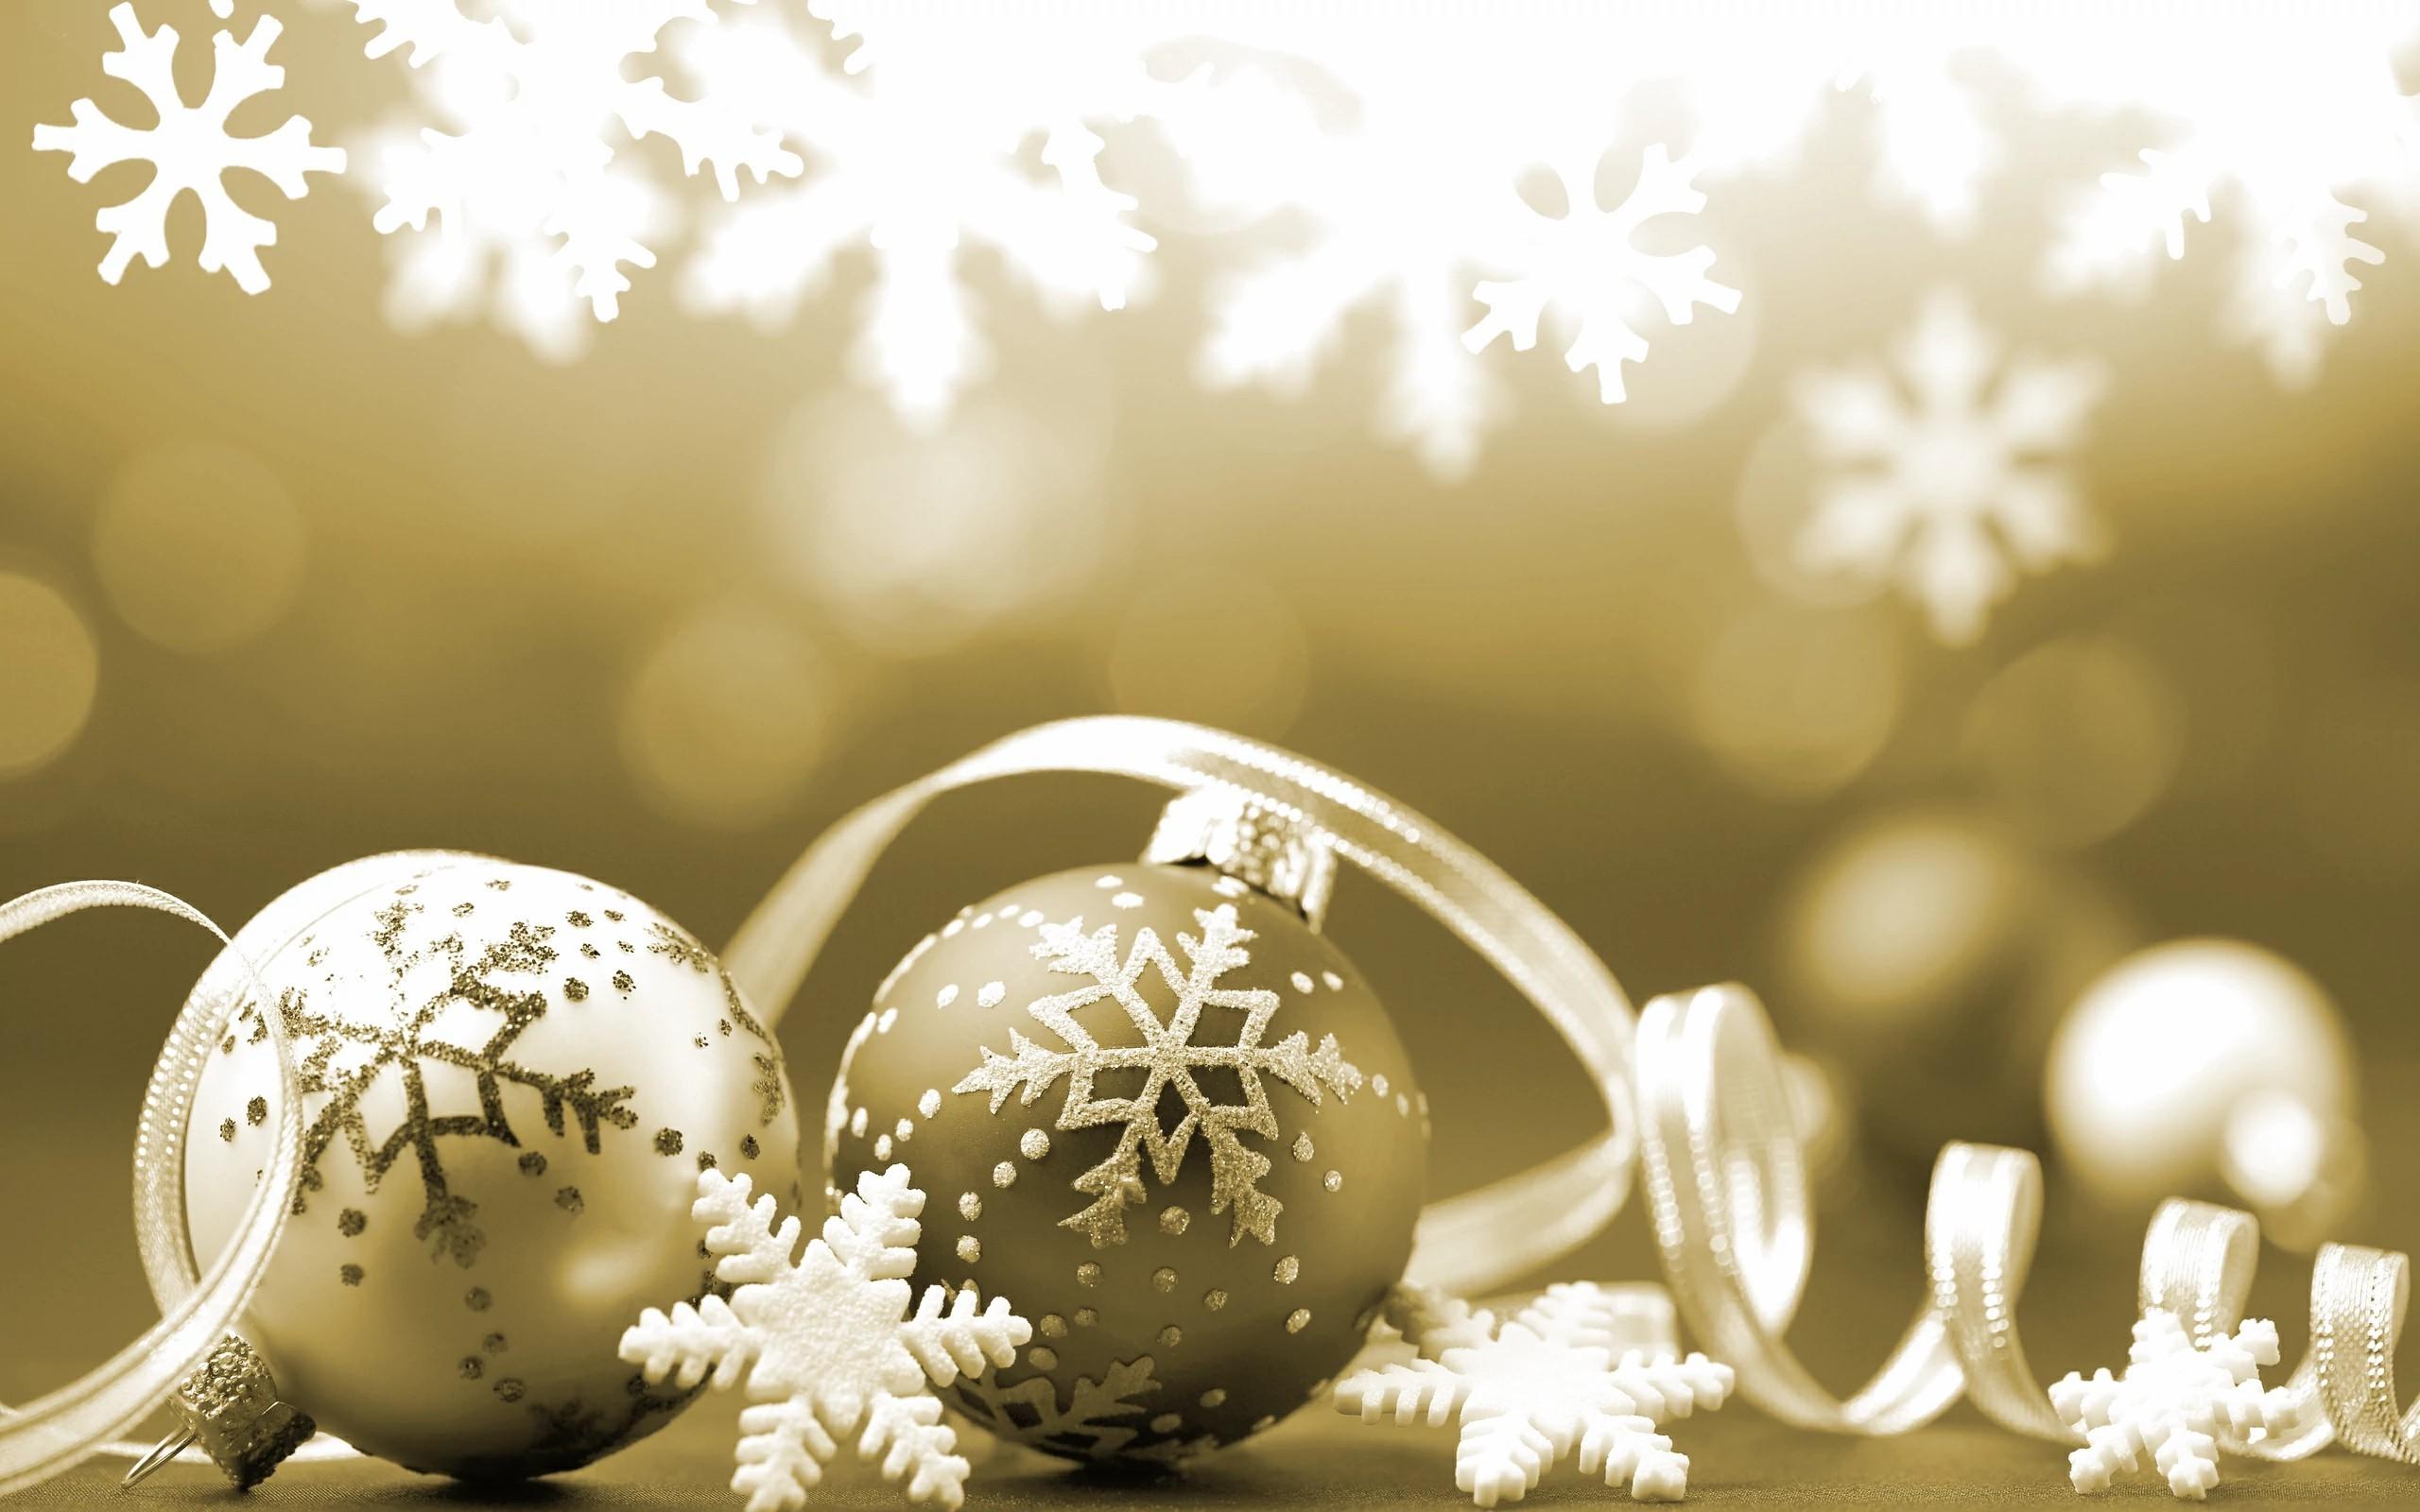 Res: 2560x1600, Merry Christmas DEsktop HD background